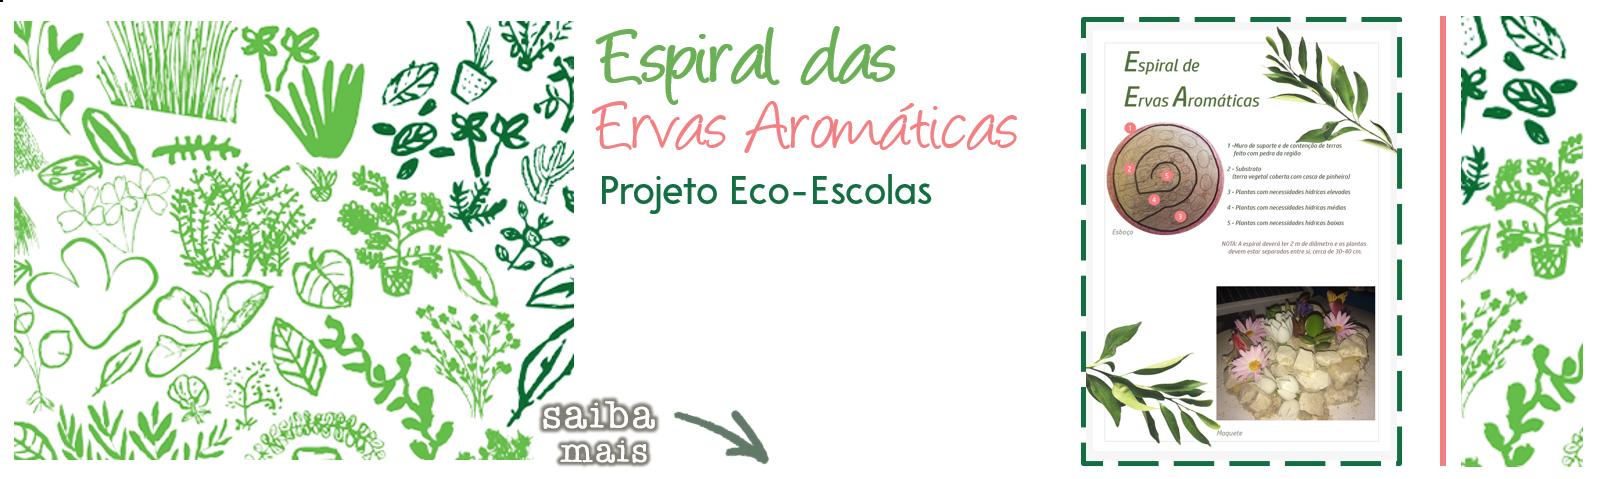 Espiral das Ervas Aromáticas|Projeto Eco-Escolas